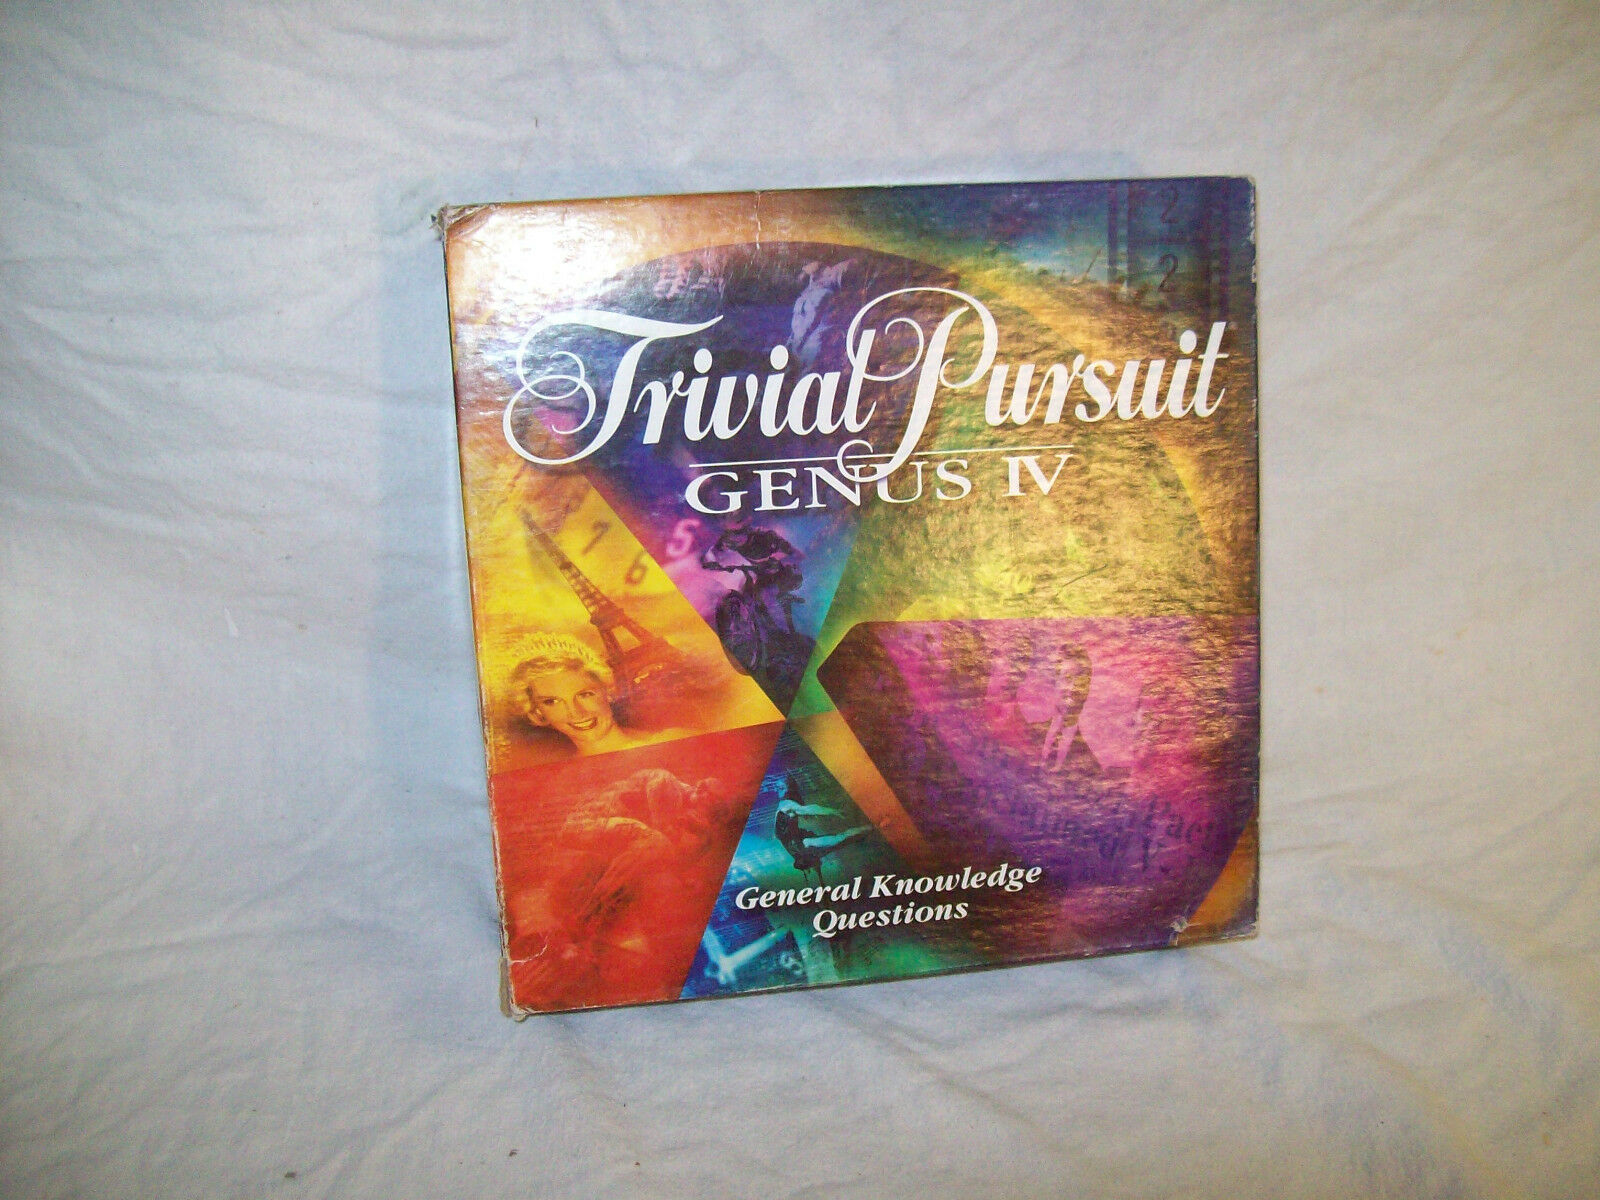 Used Trivial Pursuit Pursuit Trivial Genus IV board game 5af840